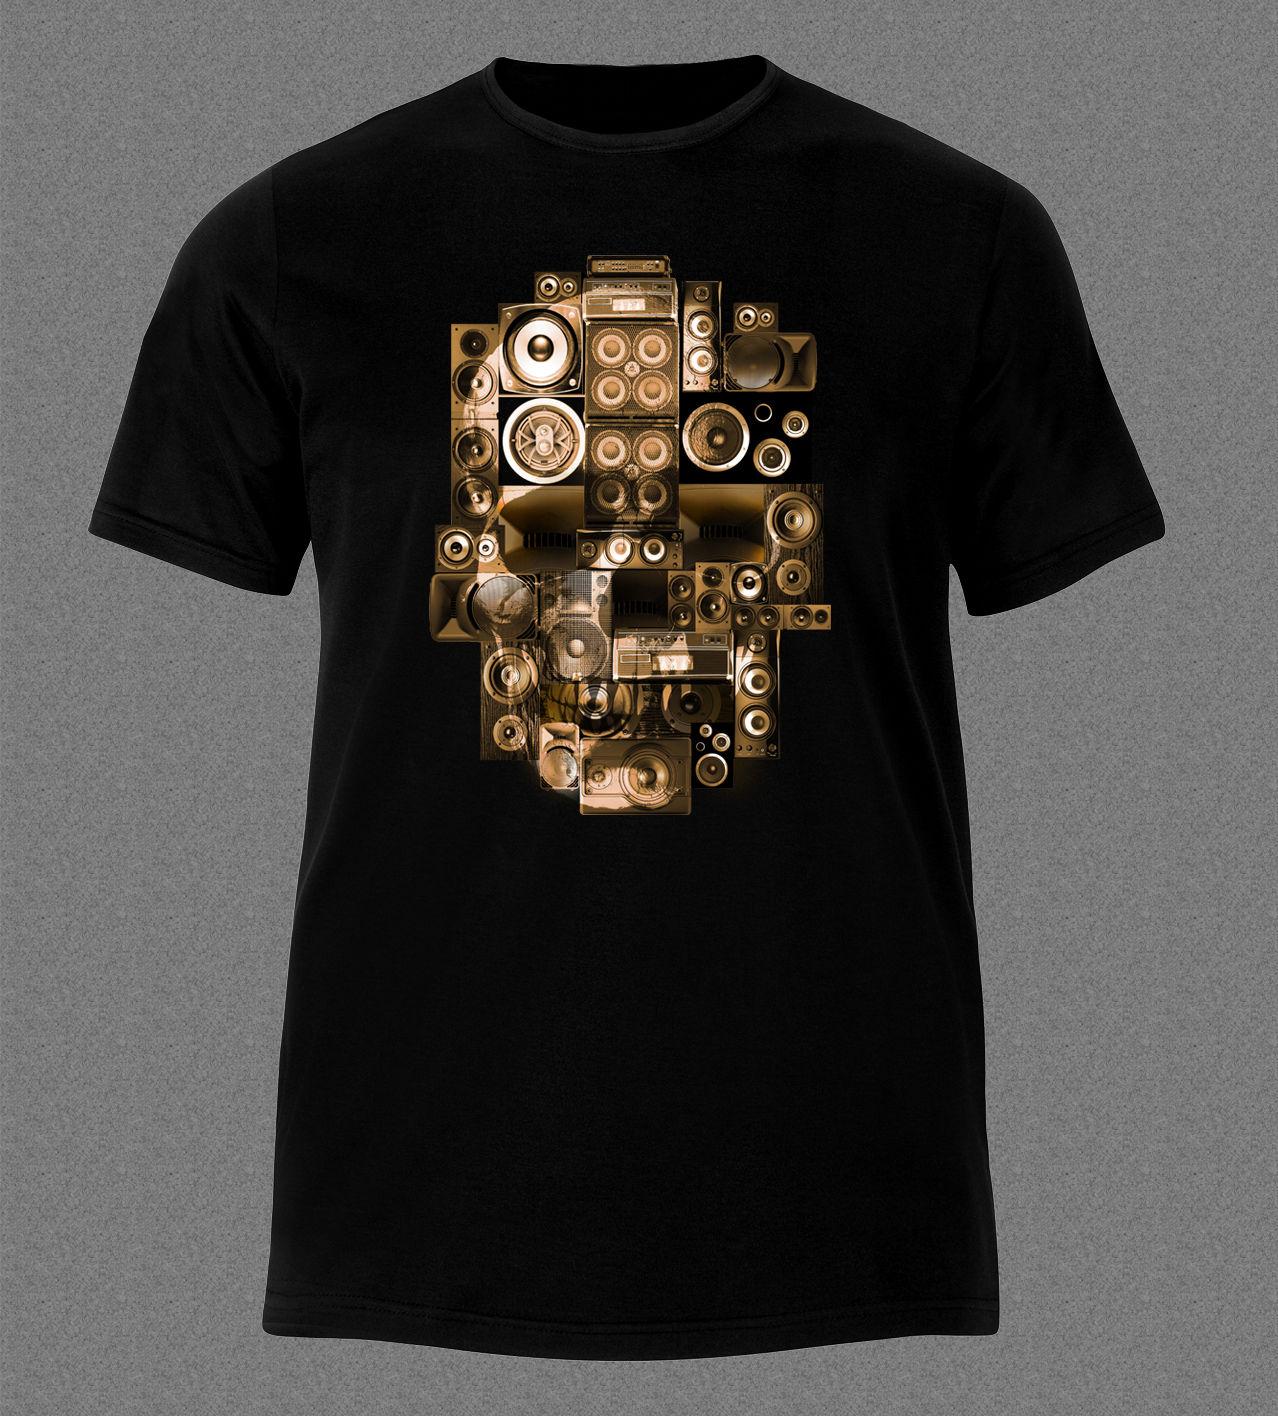 Drawn music dj speaker Shirt Dubstep for Speakers Fabric